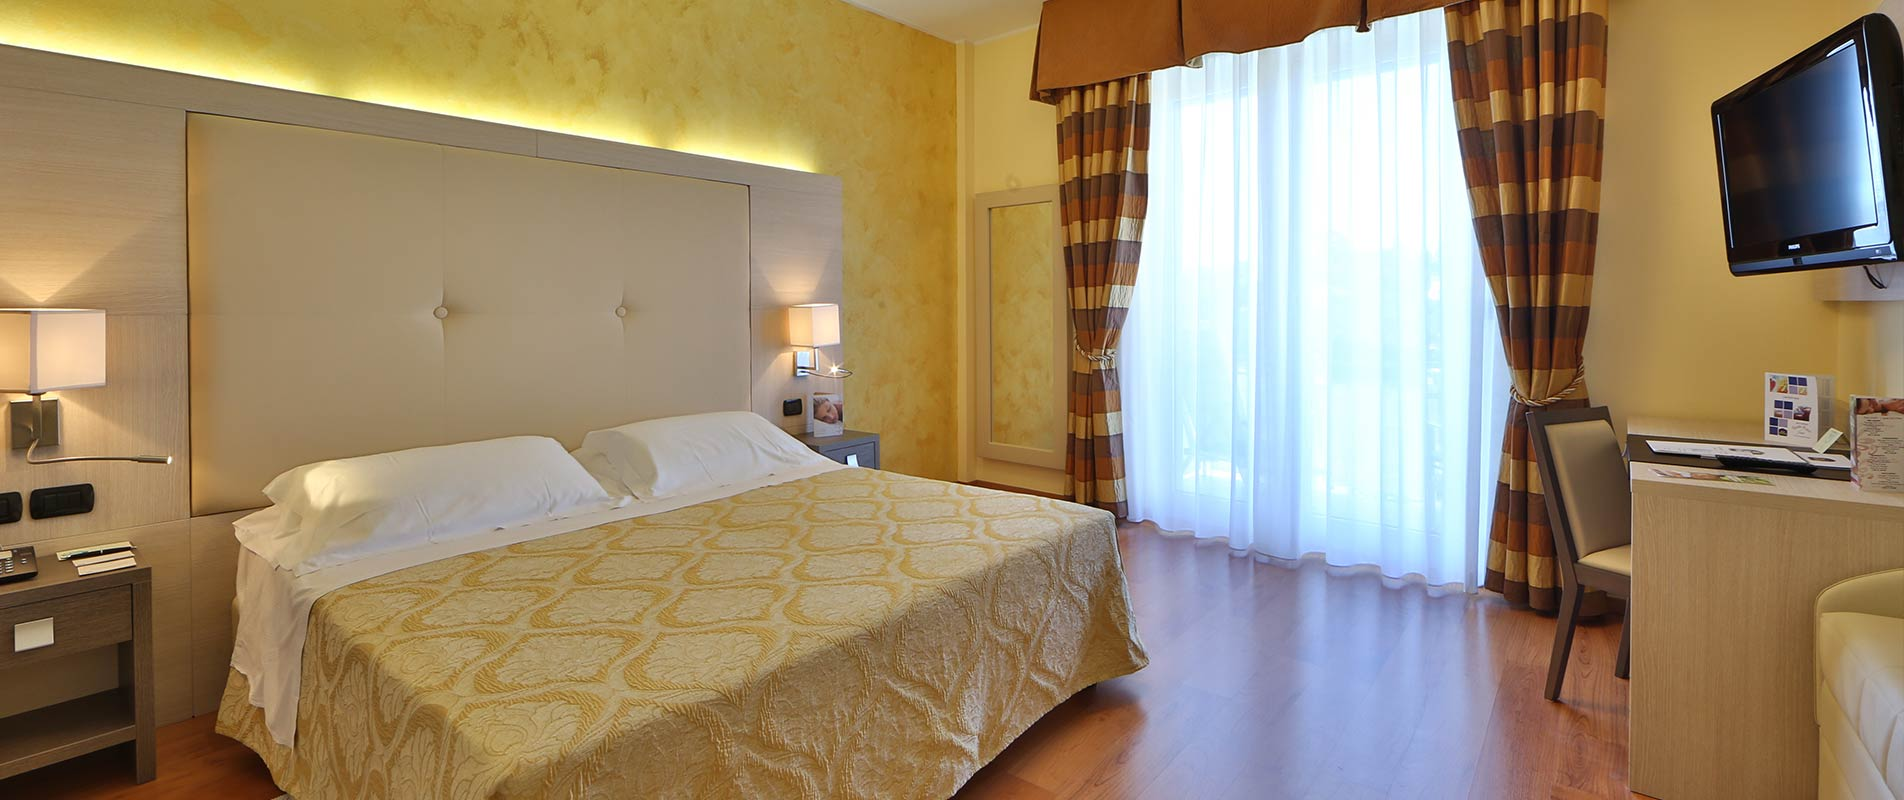 Camera Hotel Rapallo - Hotel Tigullio Royal